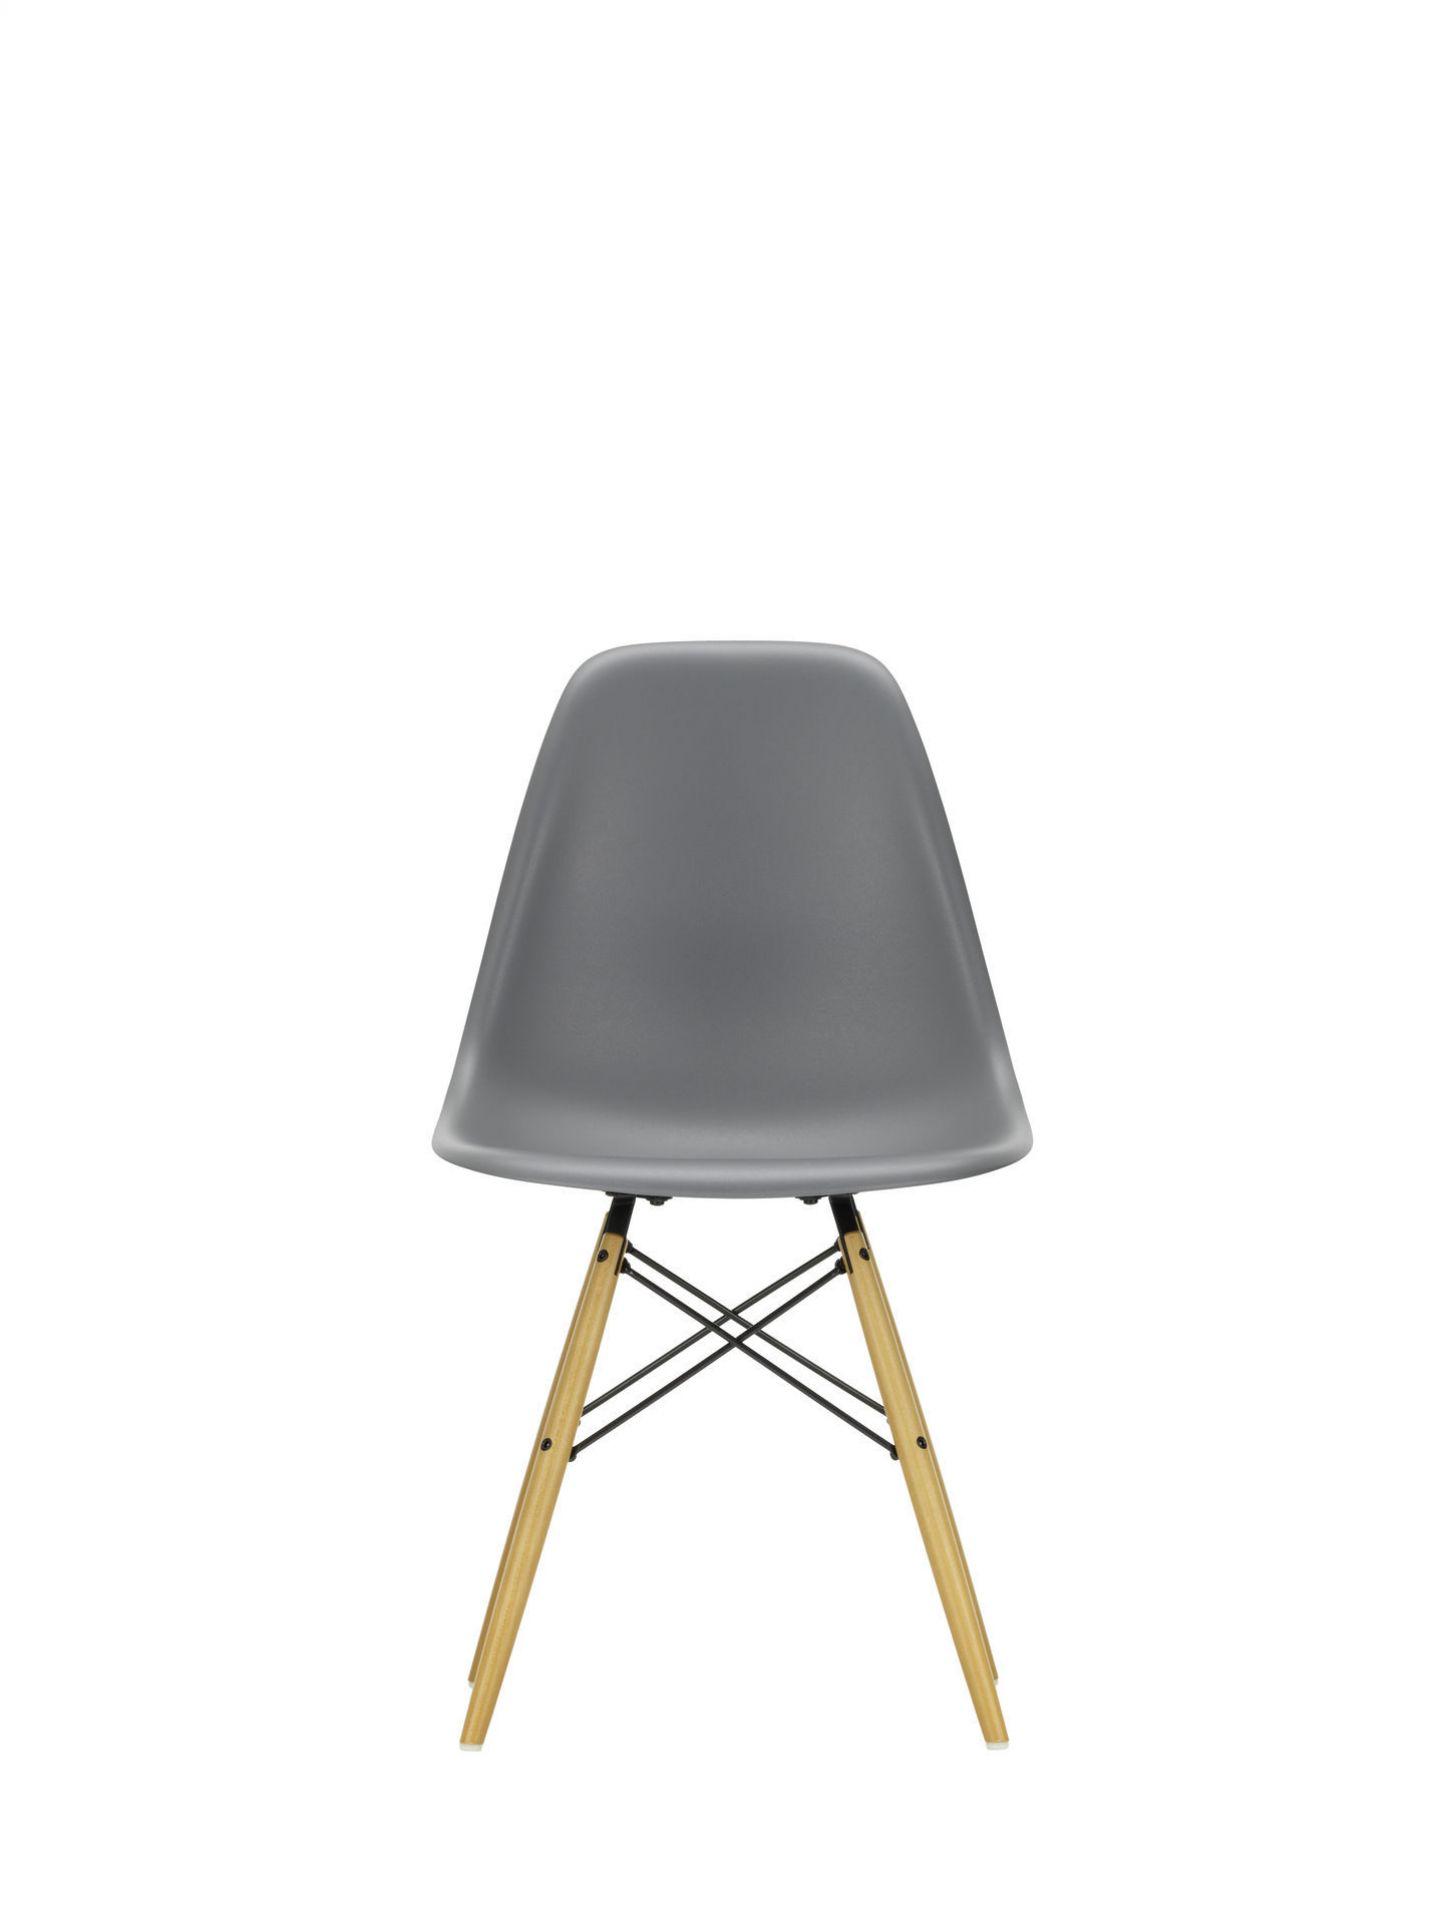 Eames Plastic Side Chair DSW Stuhl Vitra Ahorn schwarz-forest